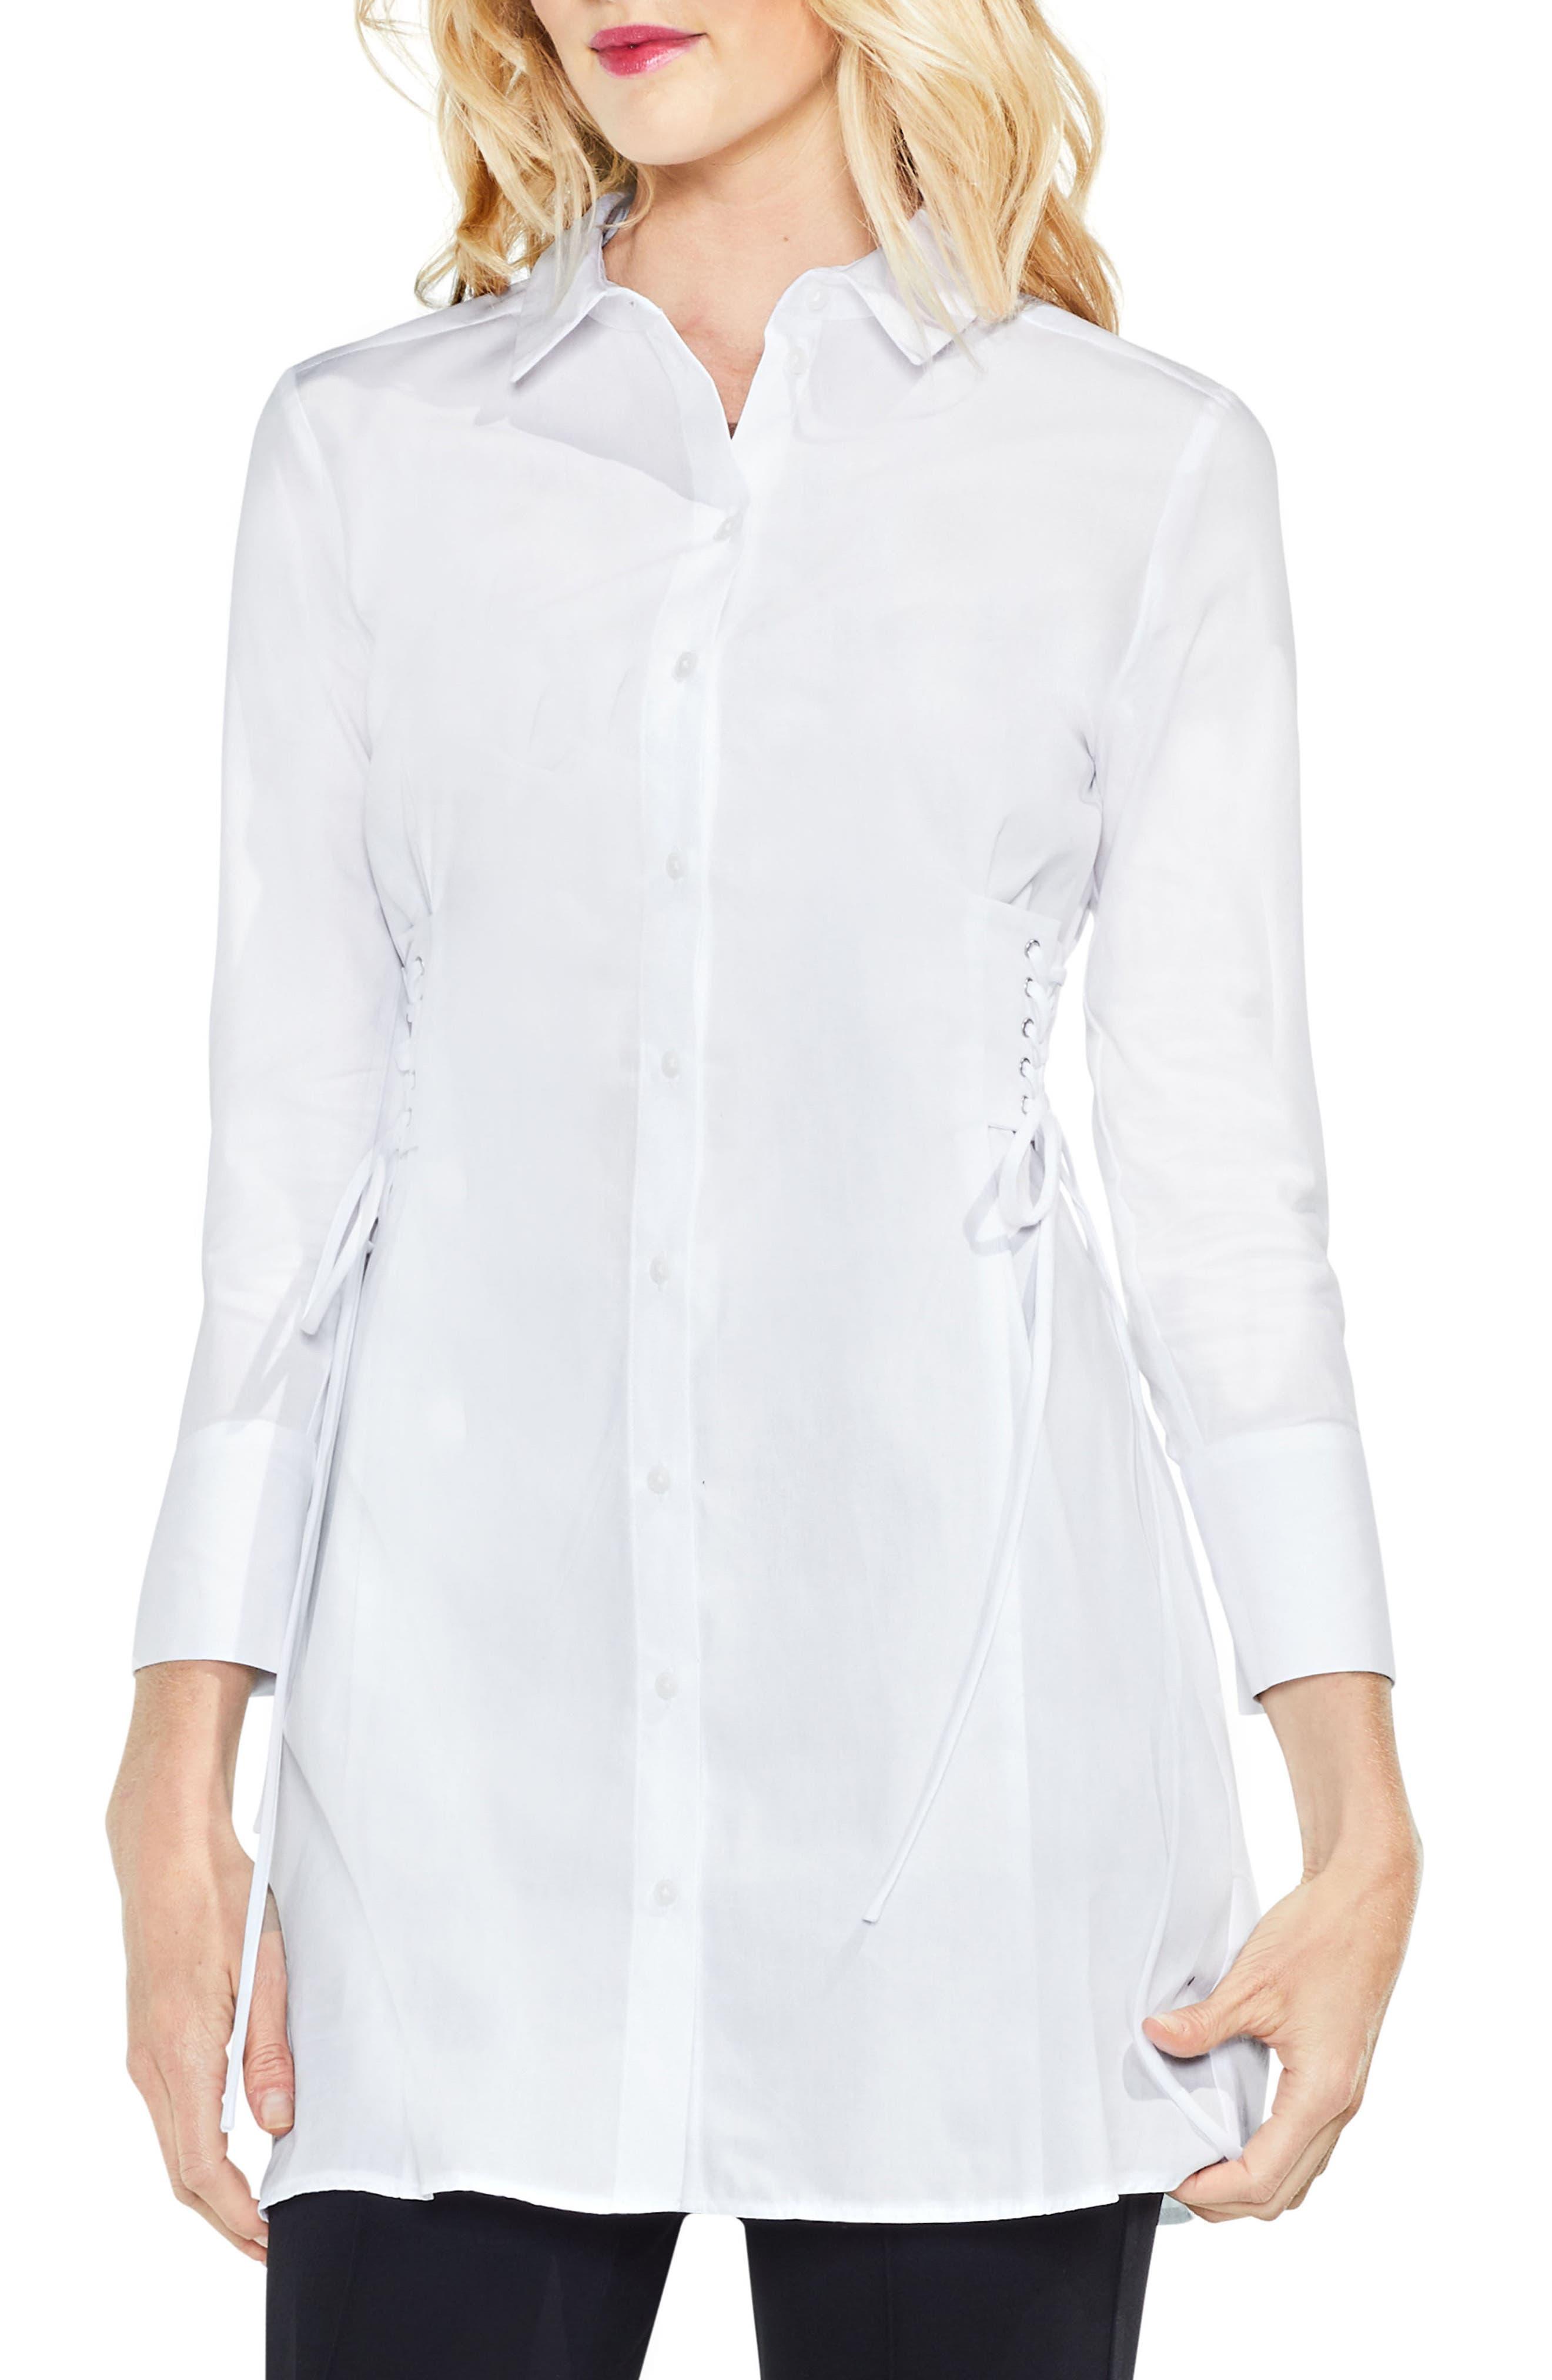 Main Image - Vince Camuto Side Lace-Up Tunic Shirt